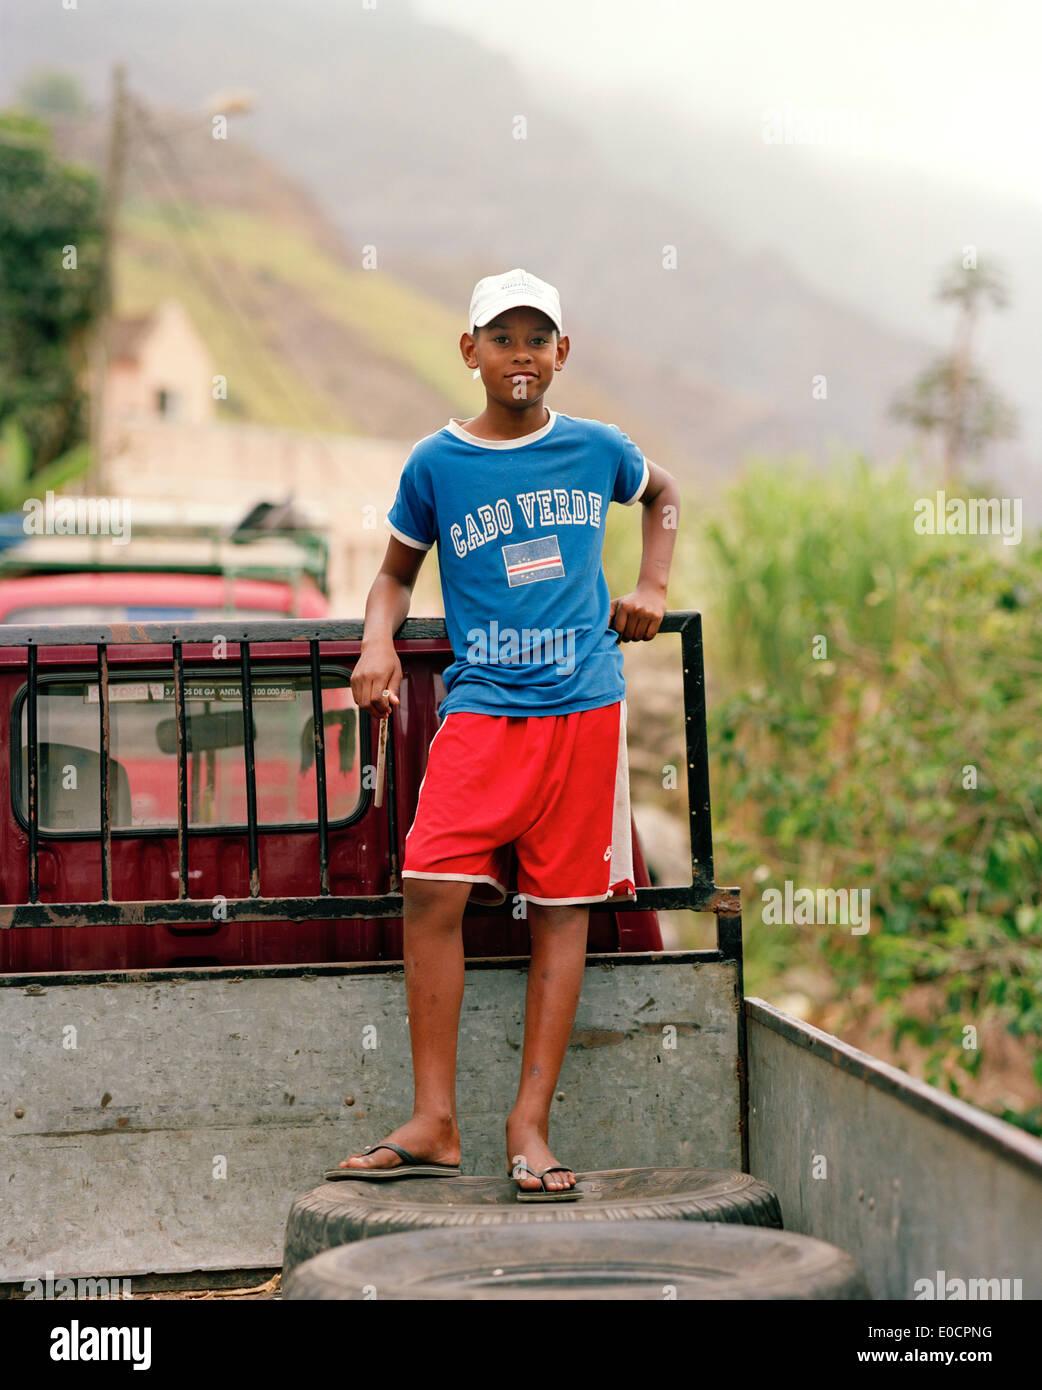 Boy on the bed of a pickup at the village Cha Manuel Dos Santos, Valle Paul, Santo Antao, Ilhas de Barlavento, Republic Stock Photo